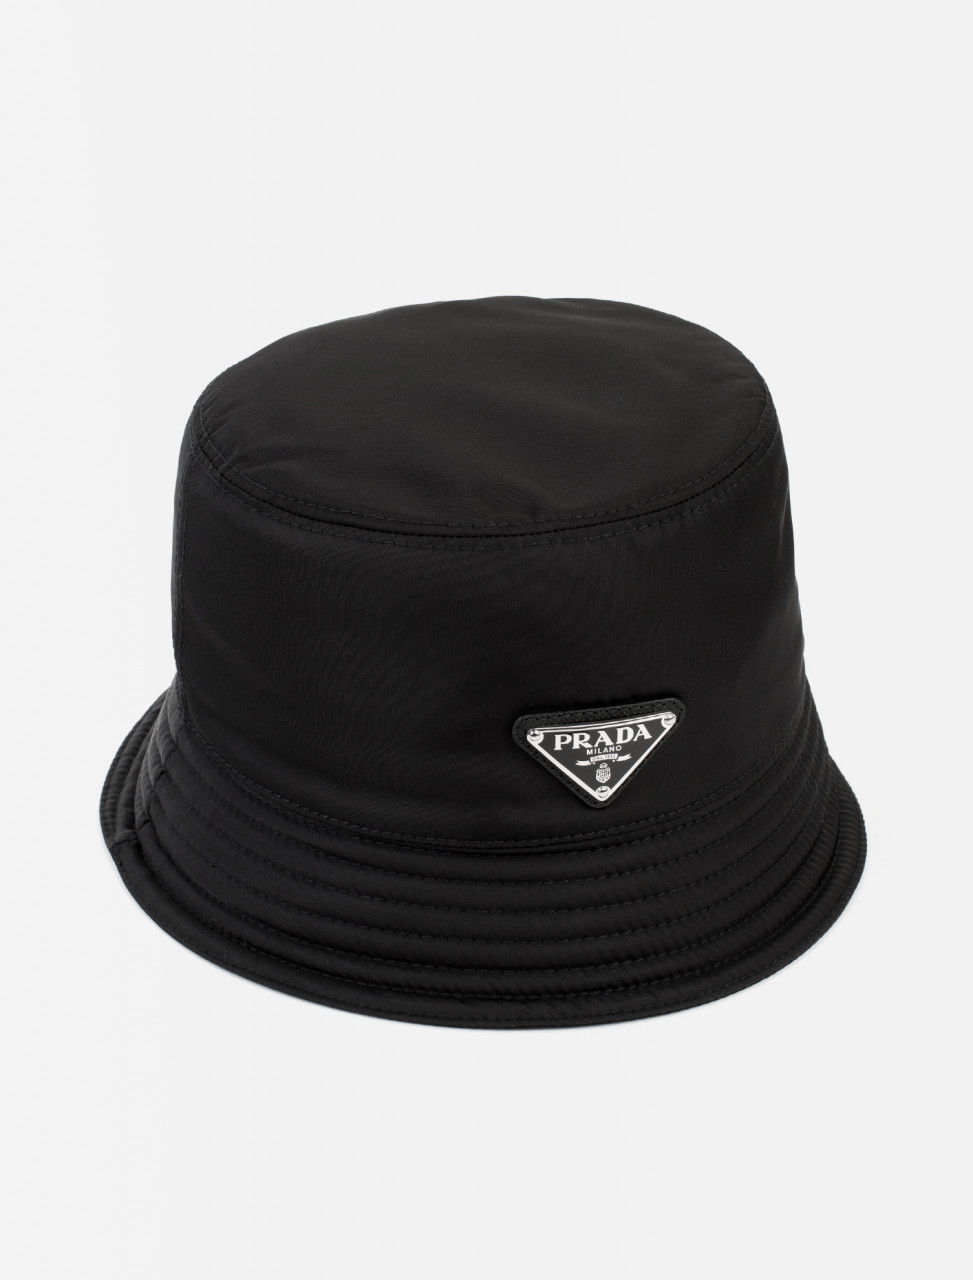 7597d07fc276 Prada Nylon Rain Hat | Voo Store Berlin | Worldwide Shipping